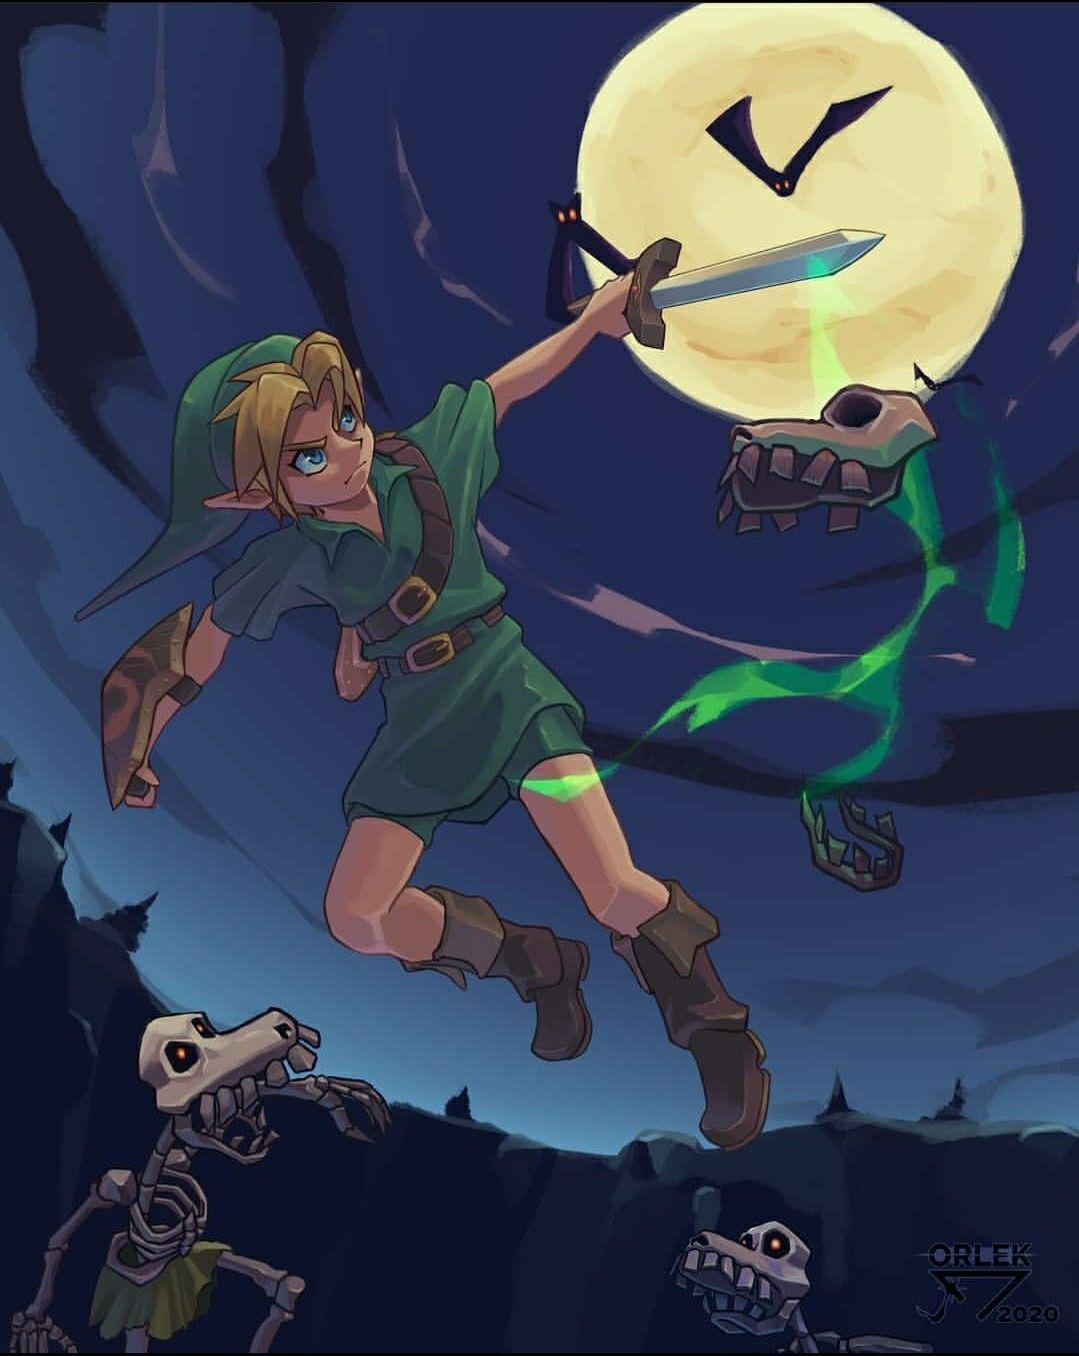 Legend Of Zelda Ocarina Of Time Art Link Warding Off Keese Stalchild Enemies Orlek Sketch In 2020 Legend Of Zelda Zelda Art Legend Of Zelda Breath